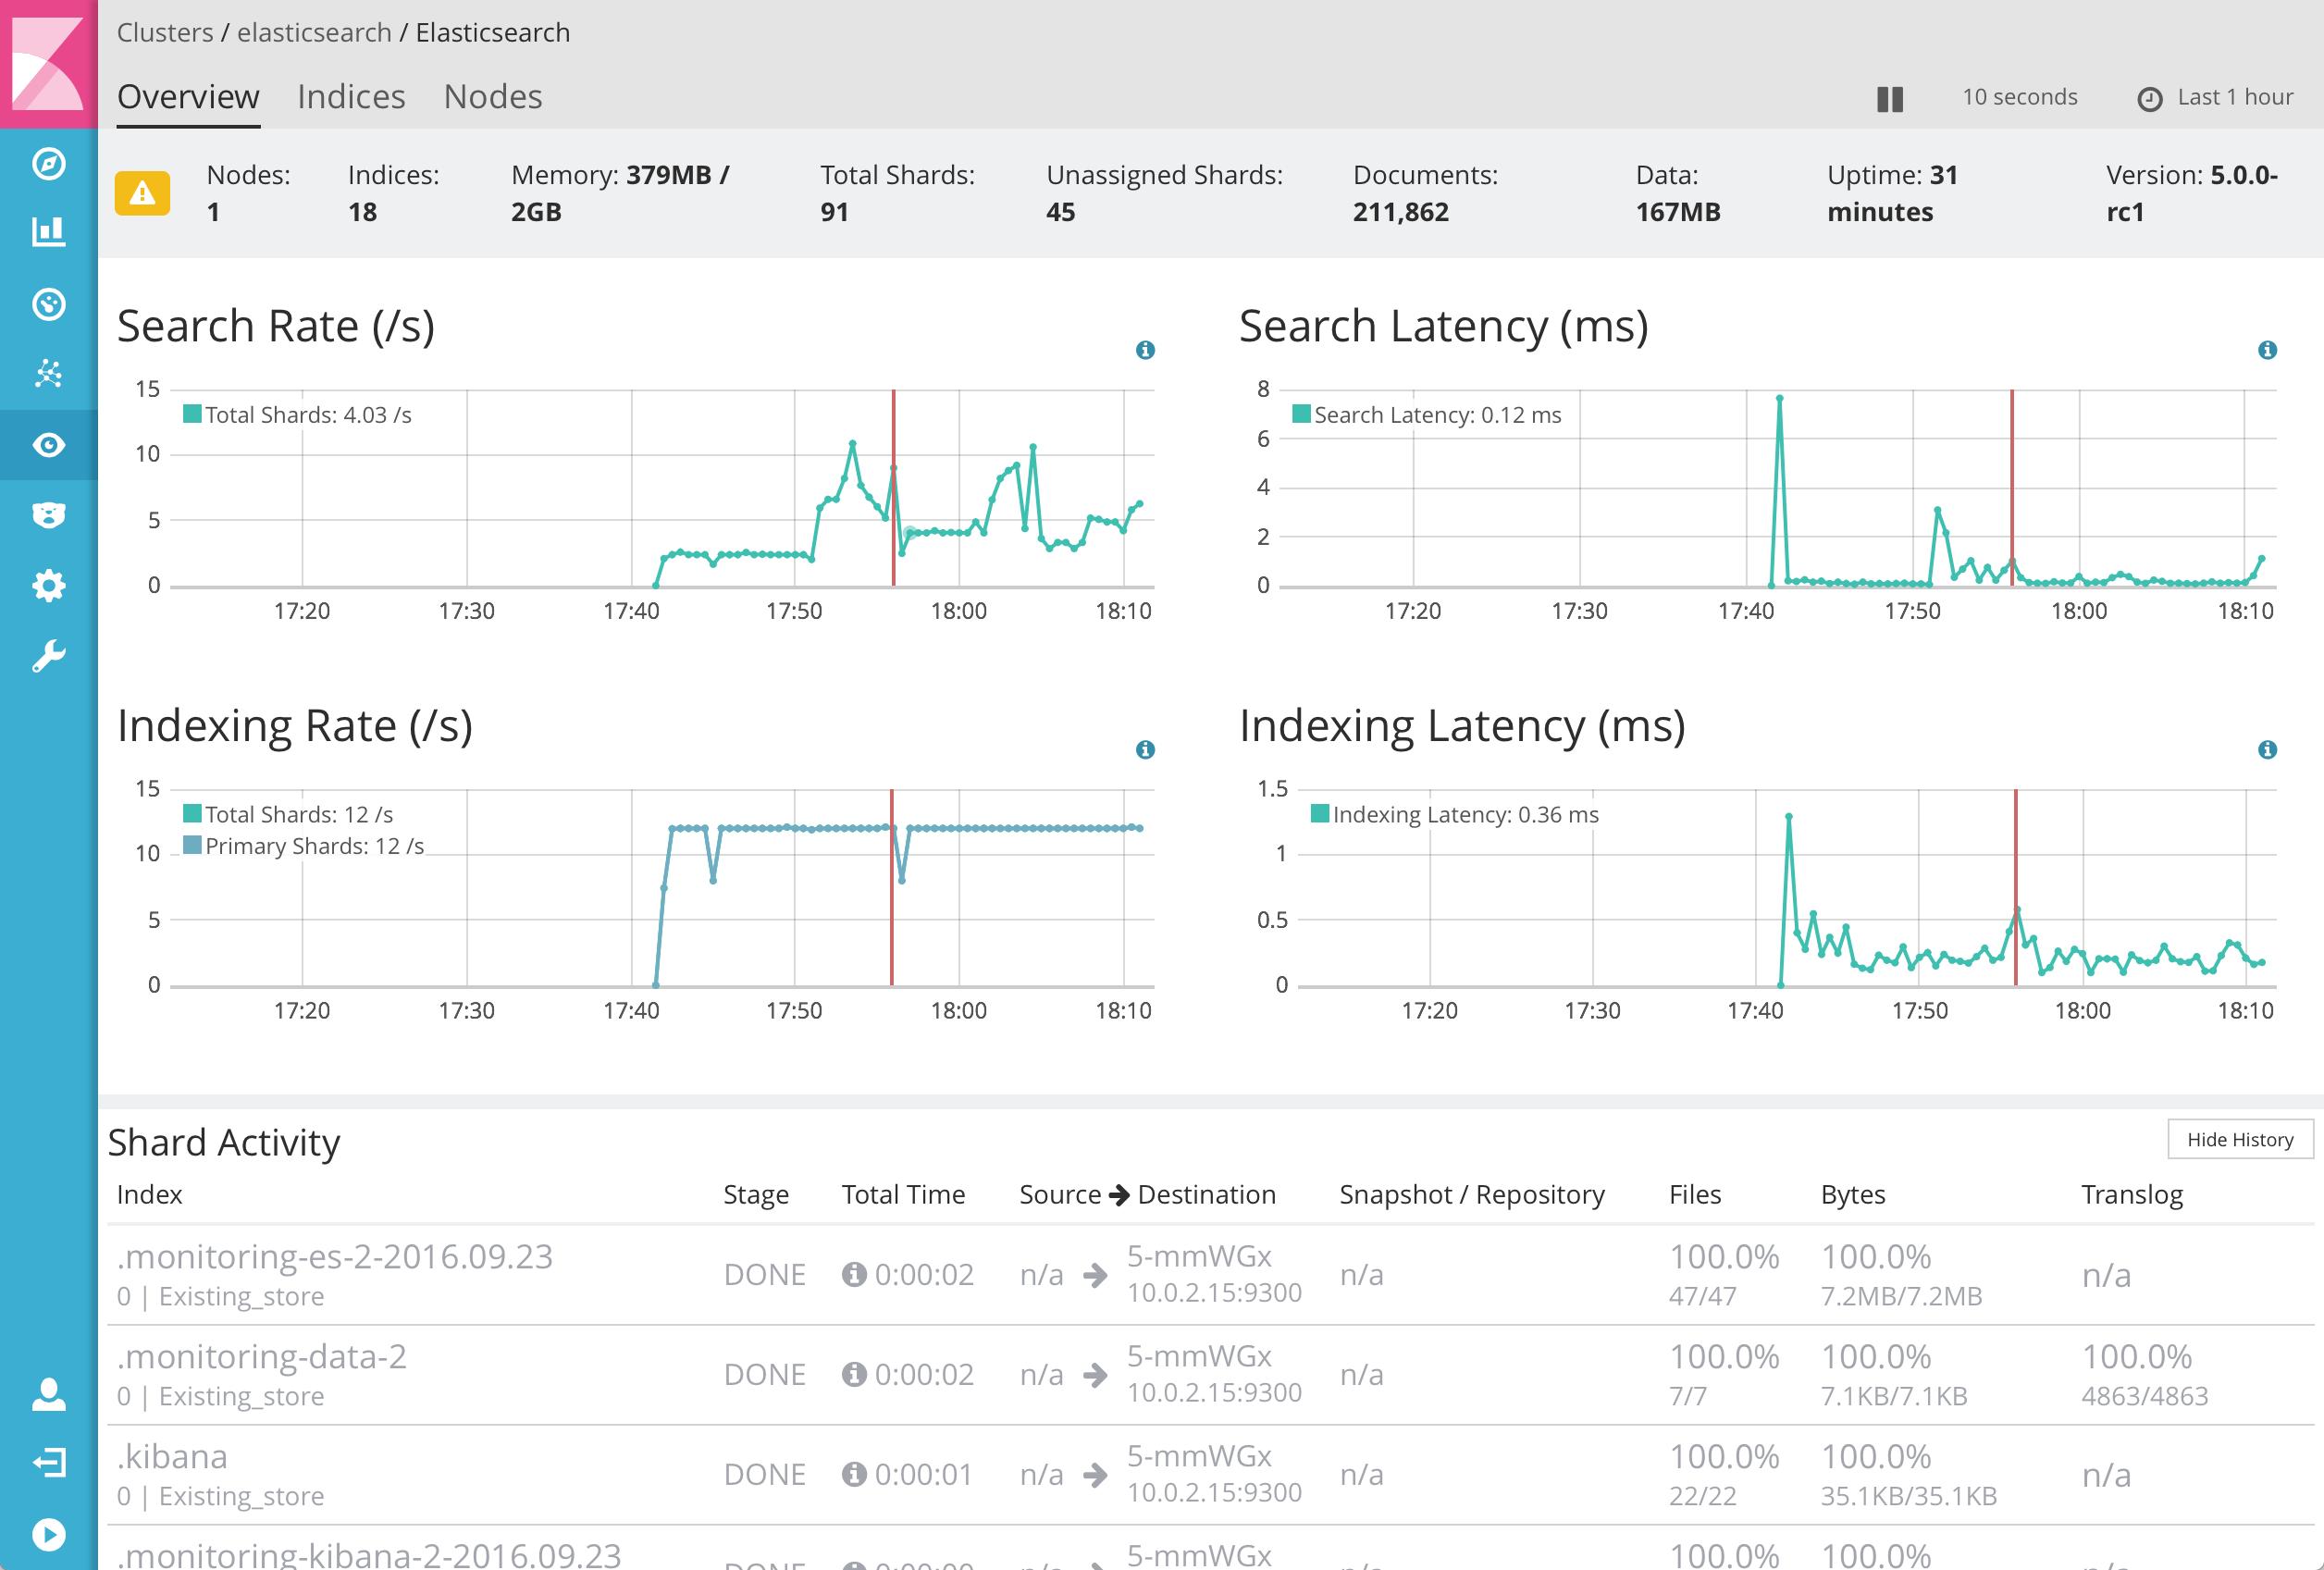 Monitoring_-_elasticsearch_-_Elasticsearch